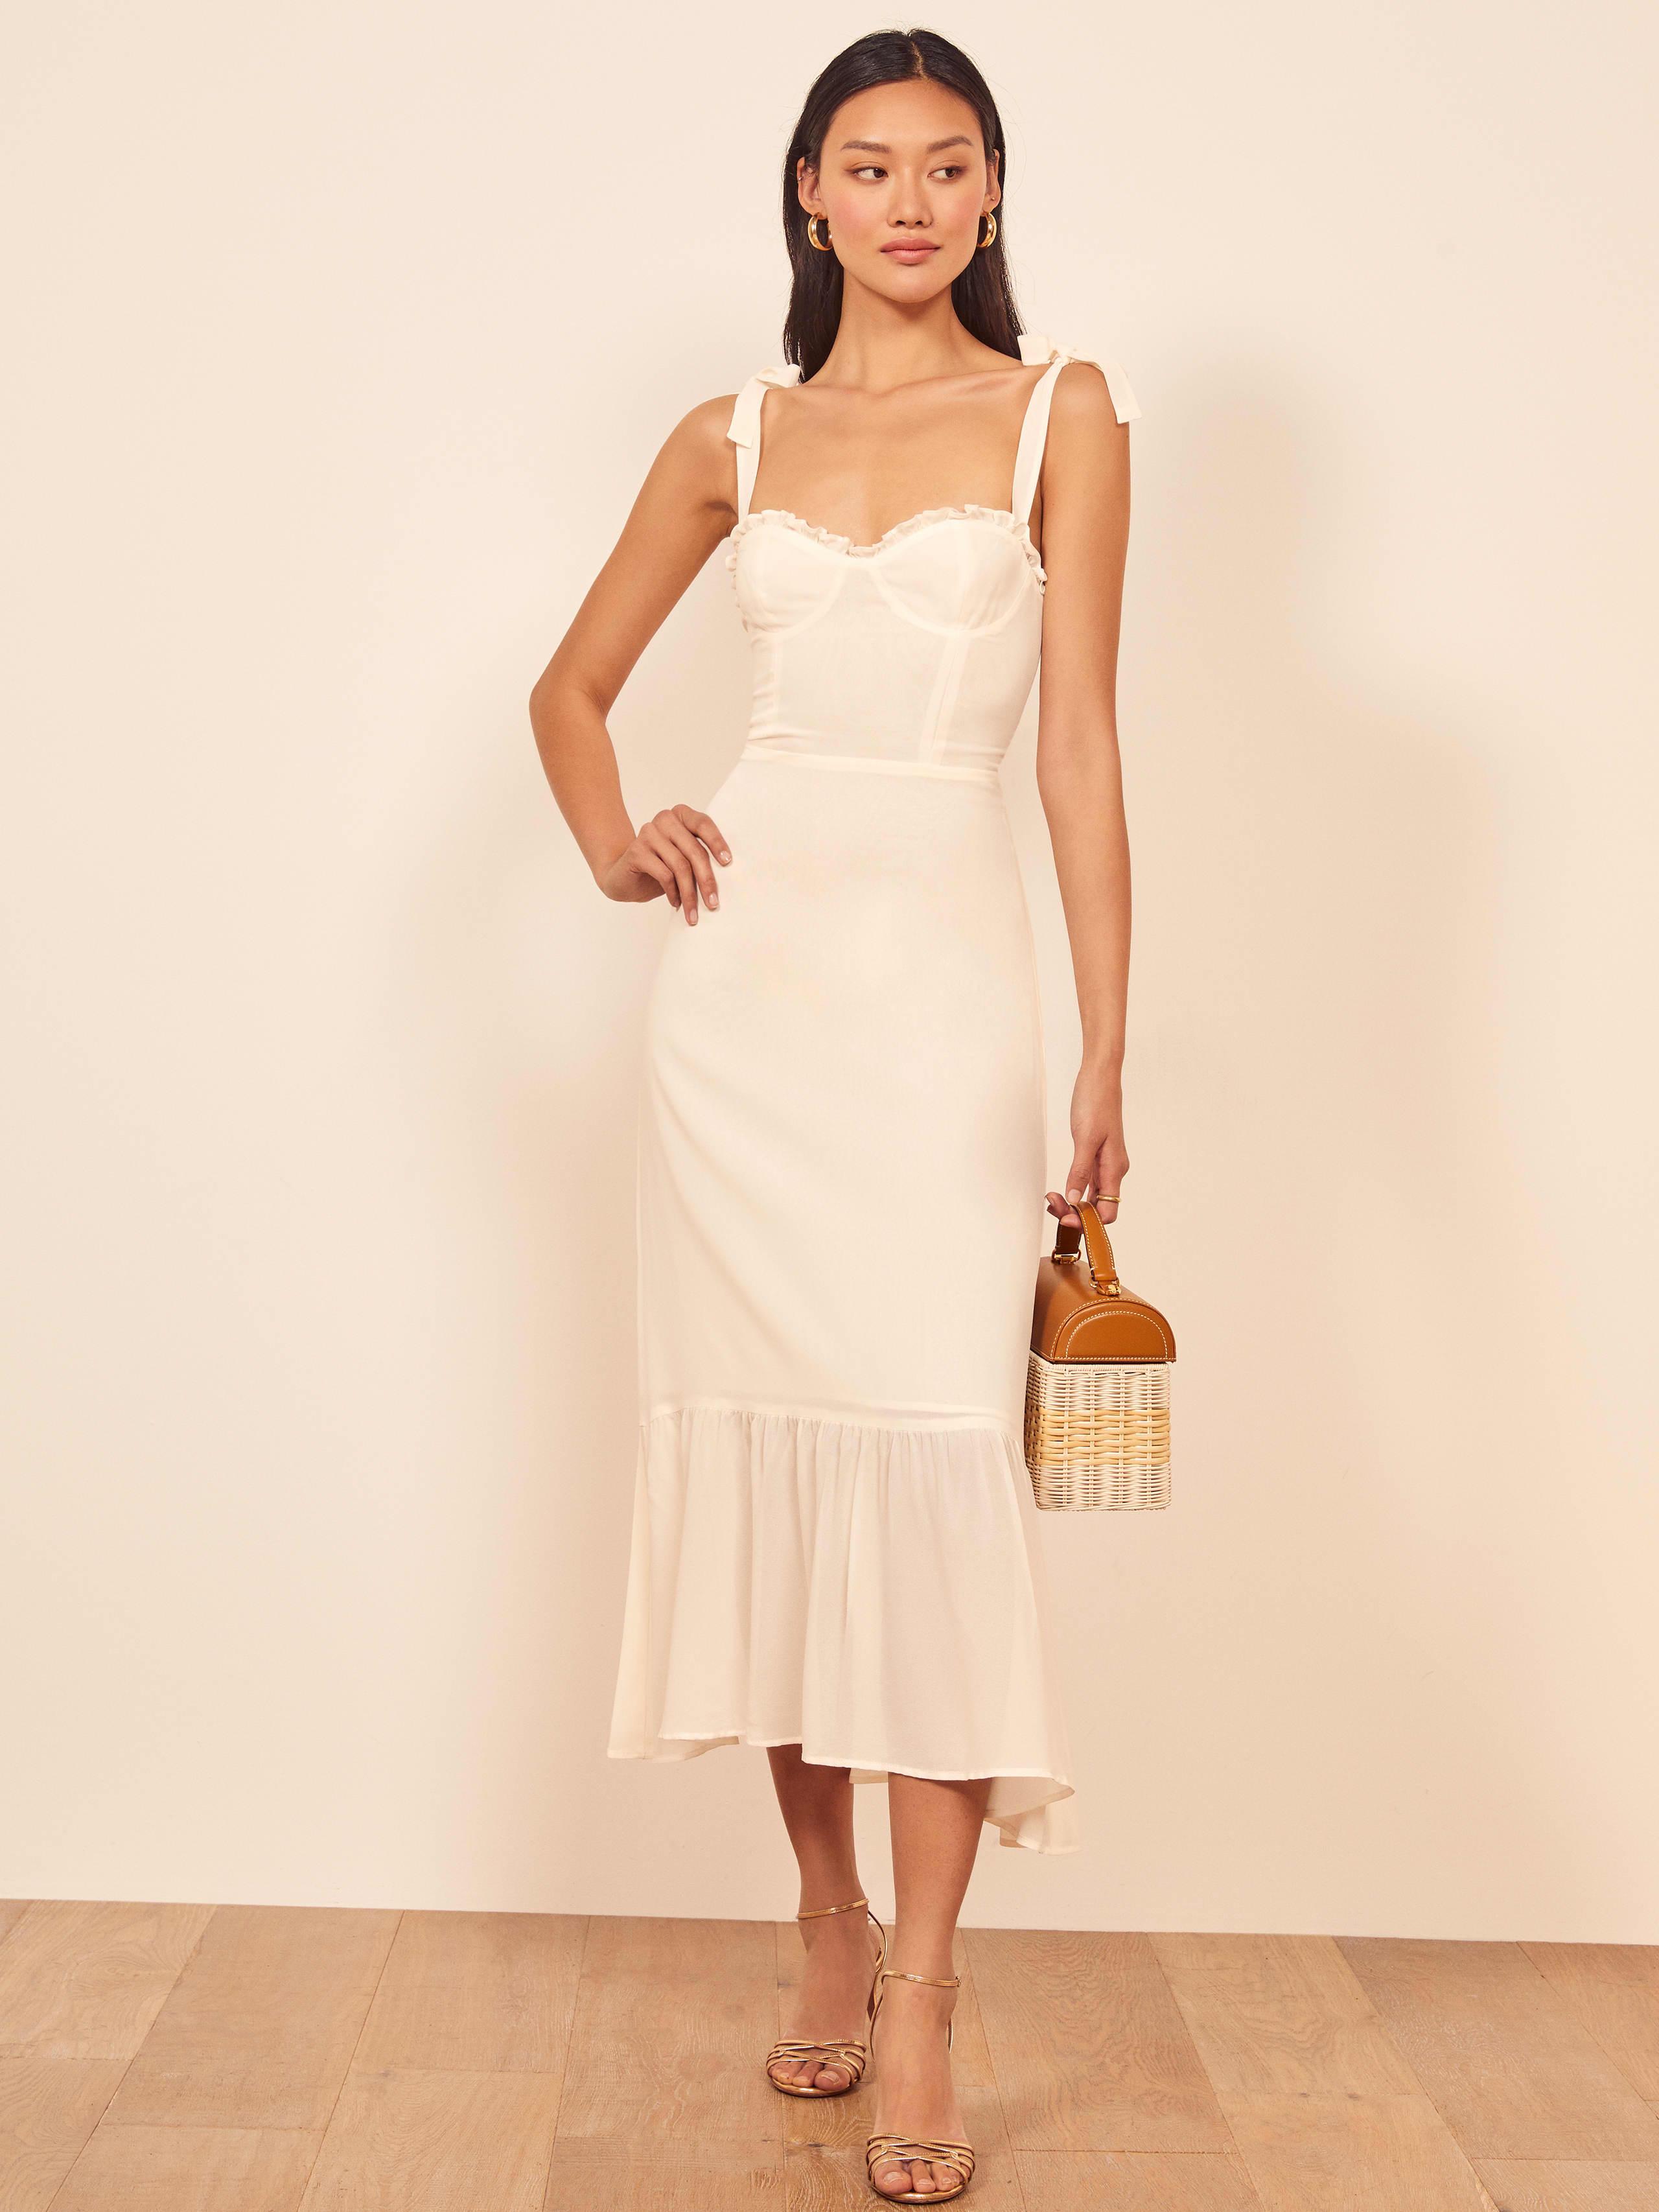 a56043cfe8bf Shop Reformation - Dresses - Shop Reformation Dresses - Reformation